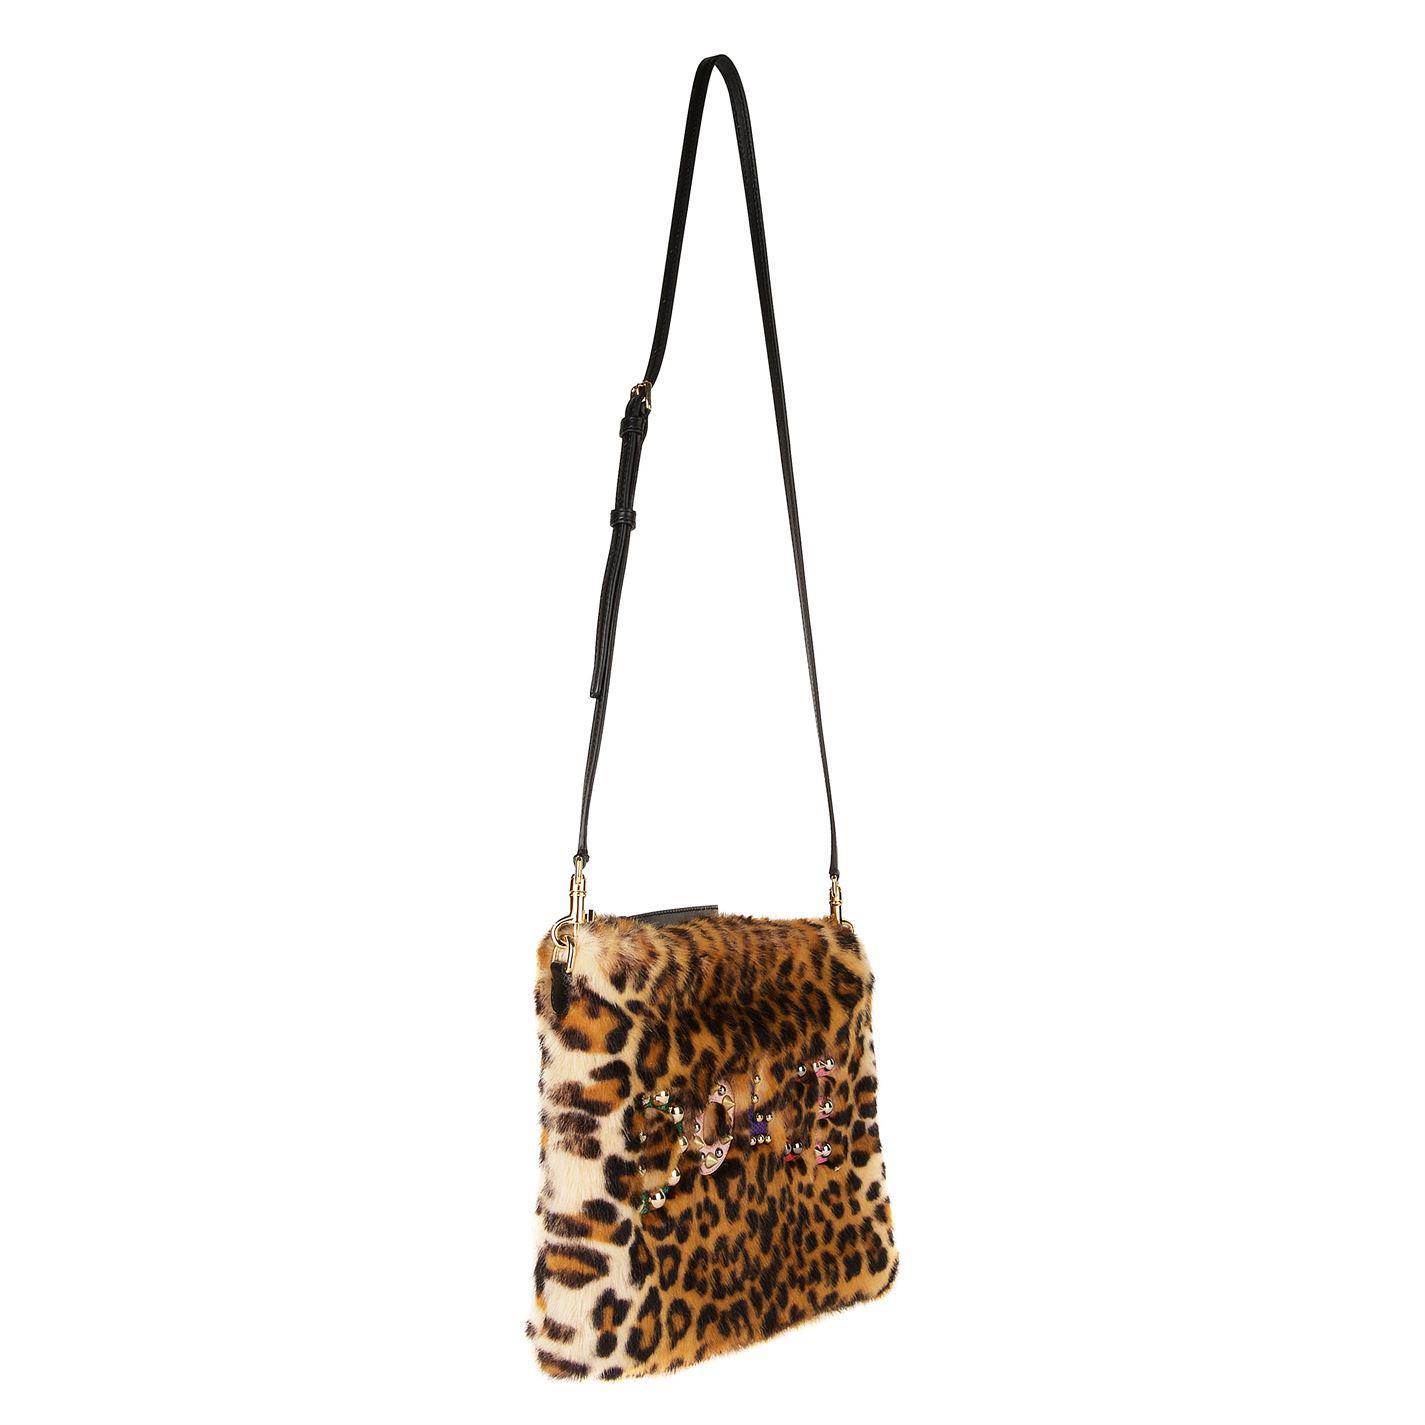 61caa1d40a25 Dolce   Gabbana Clio Faux Fur Cross Body Bag in Brown - Lyst